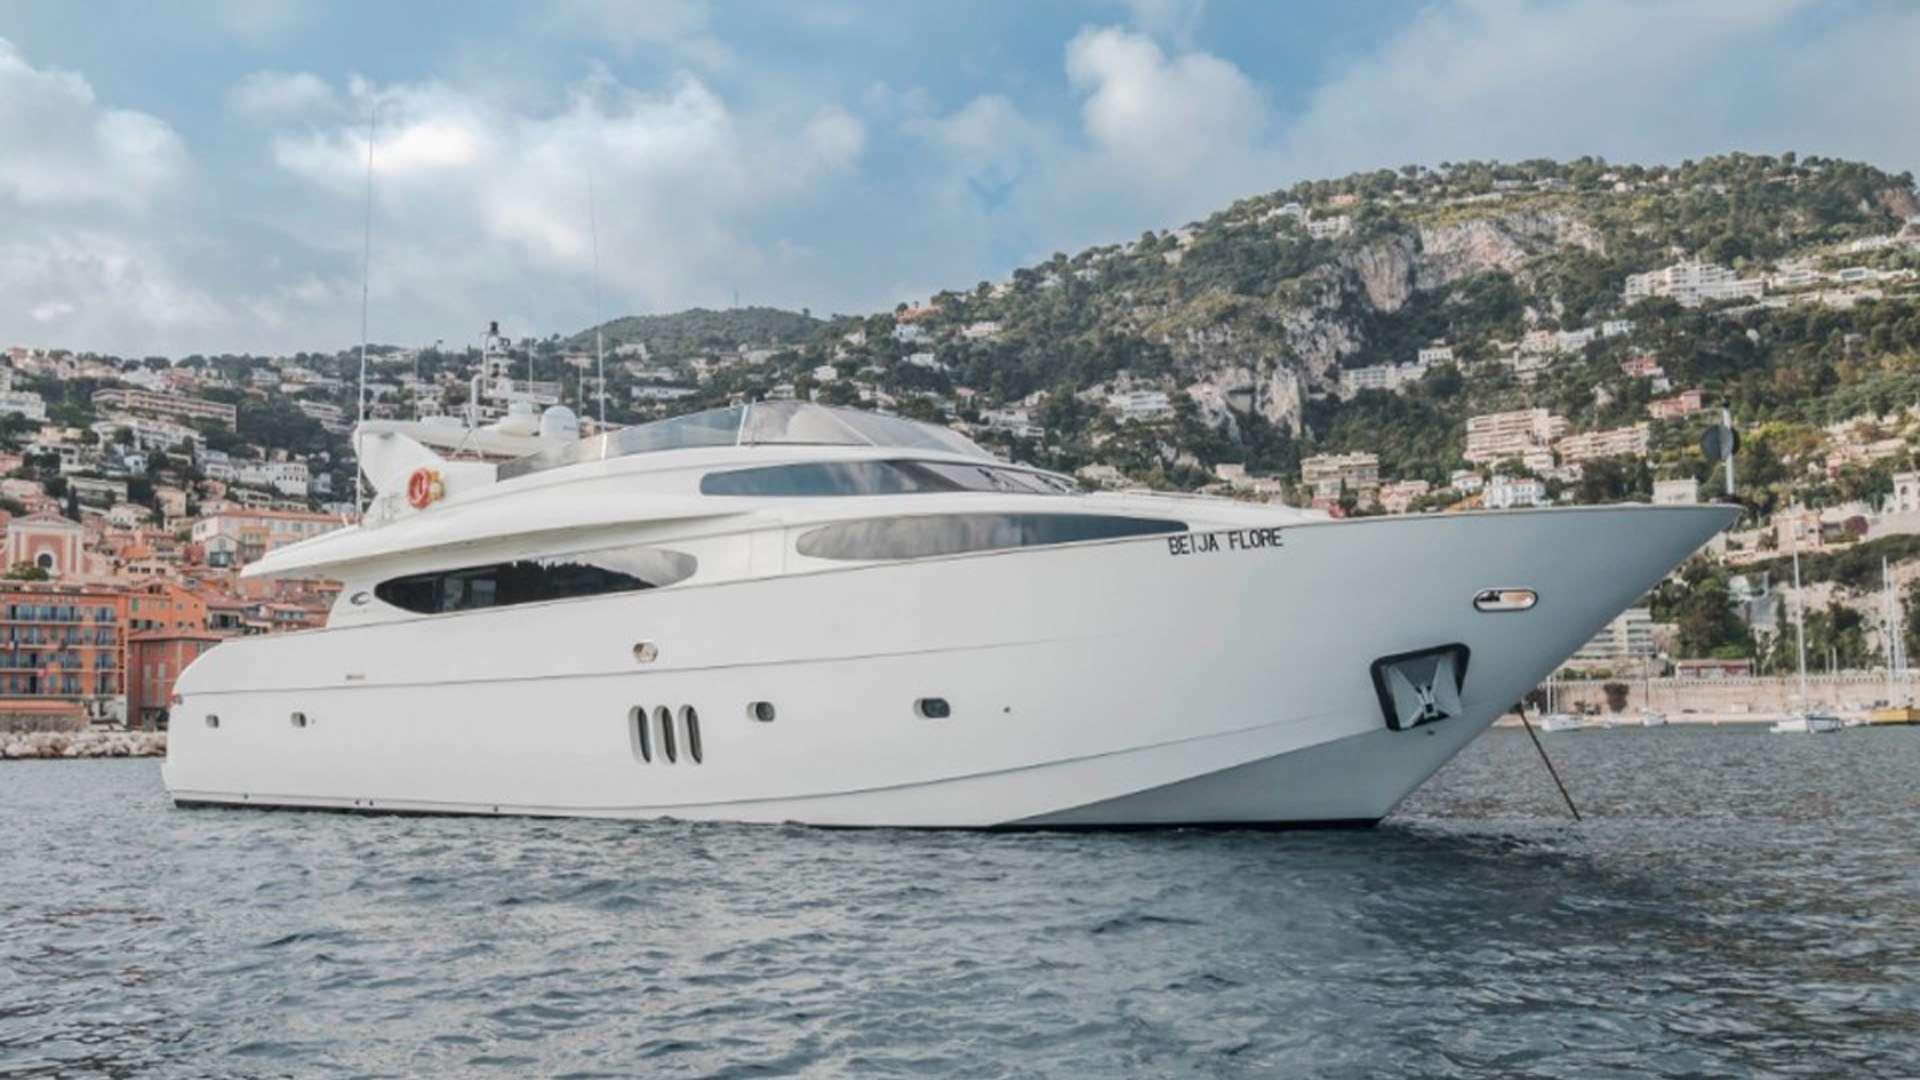 Motor yacht BEIJA FLORE